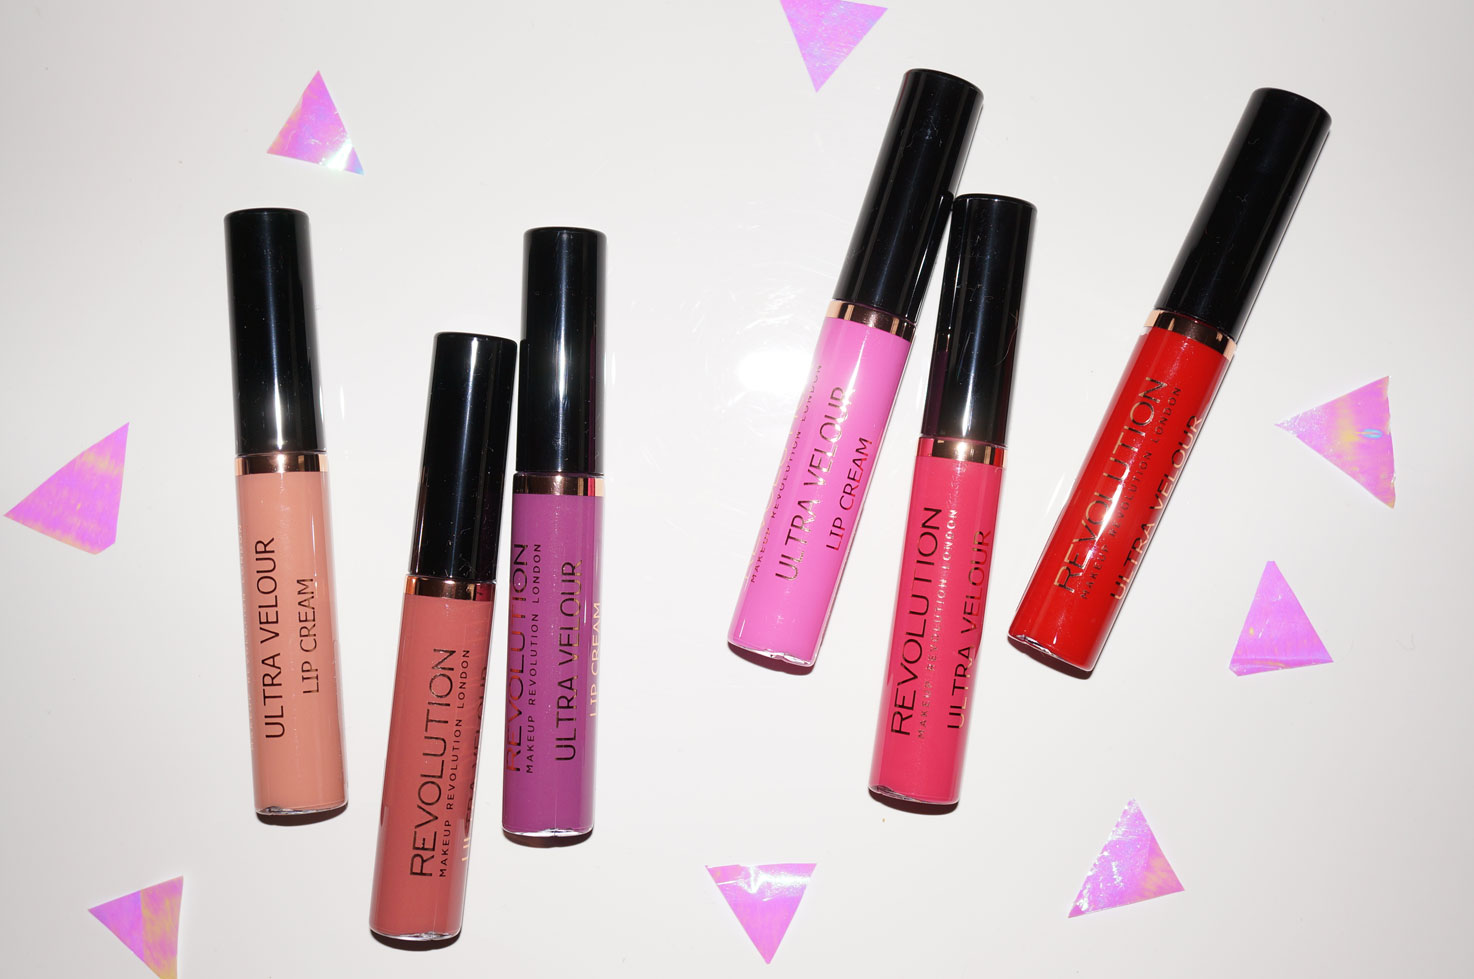 makeup-revolution-ultra-velour-lip-cream-review ...